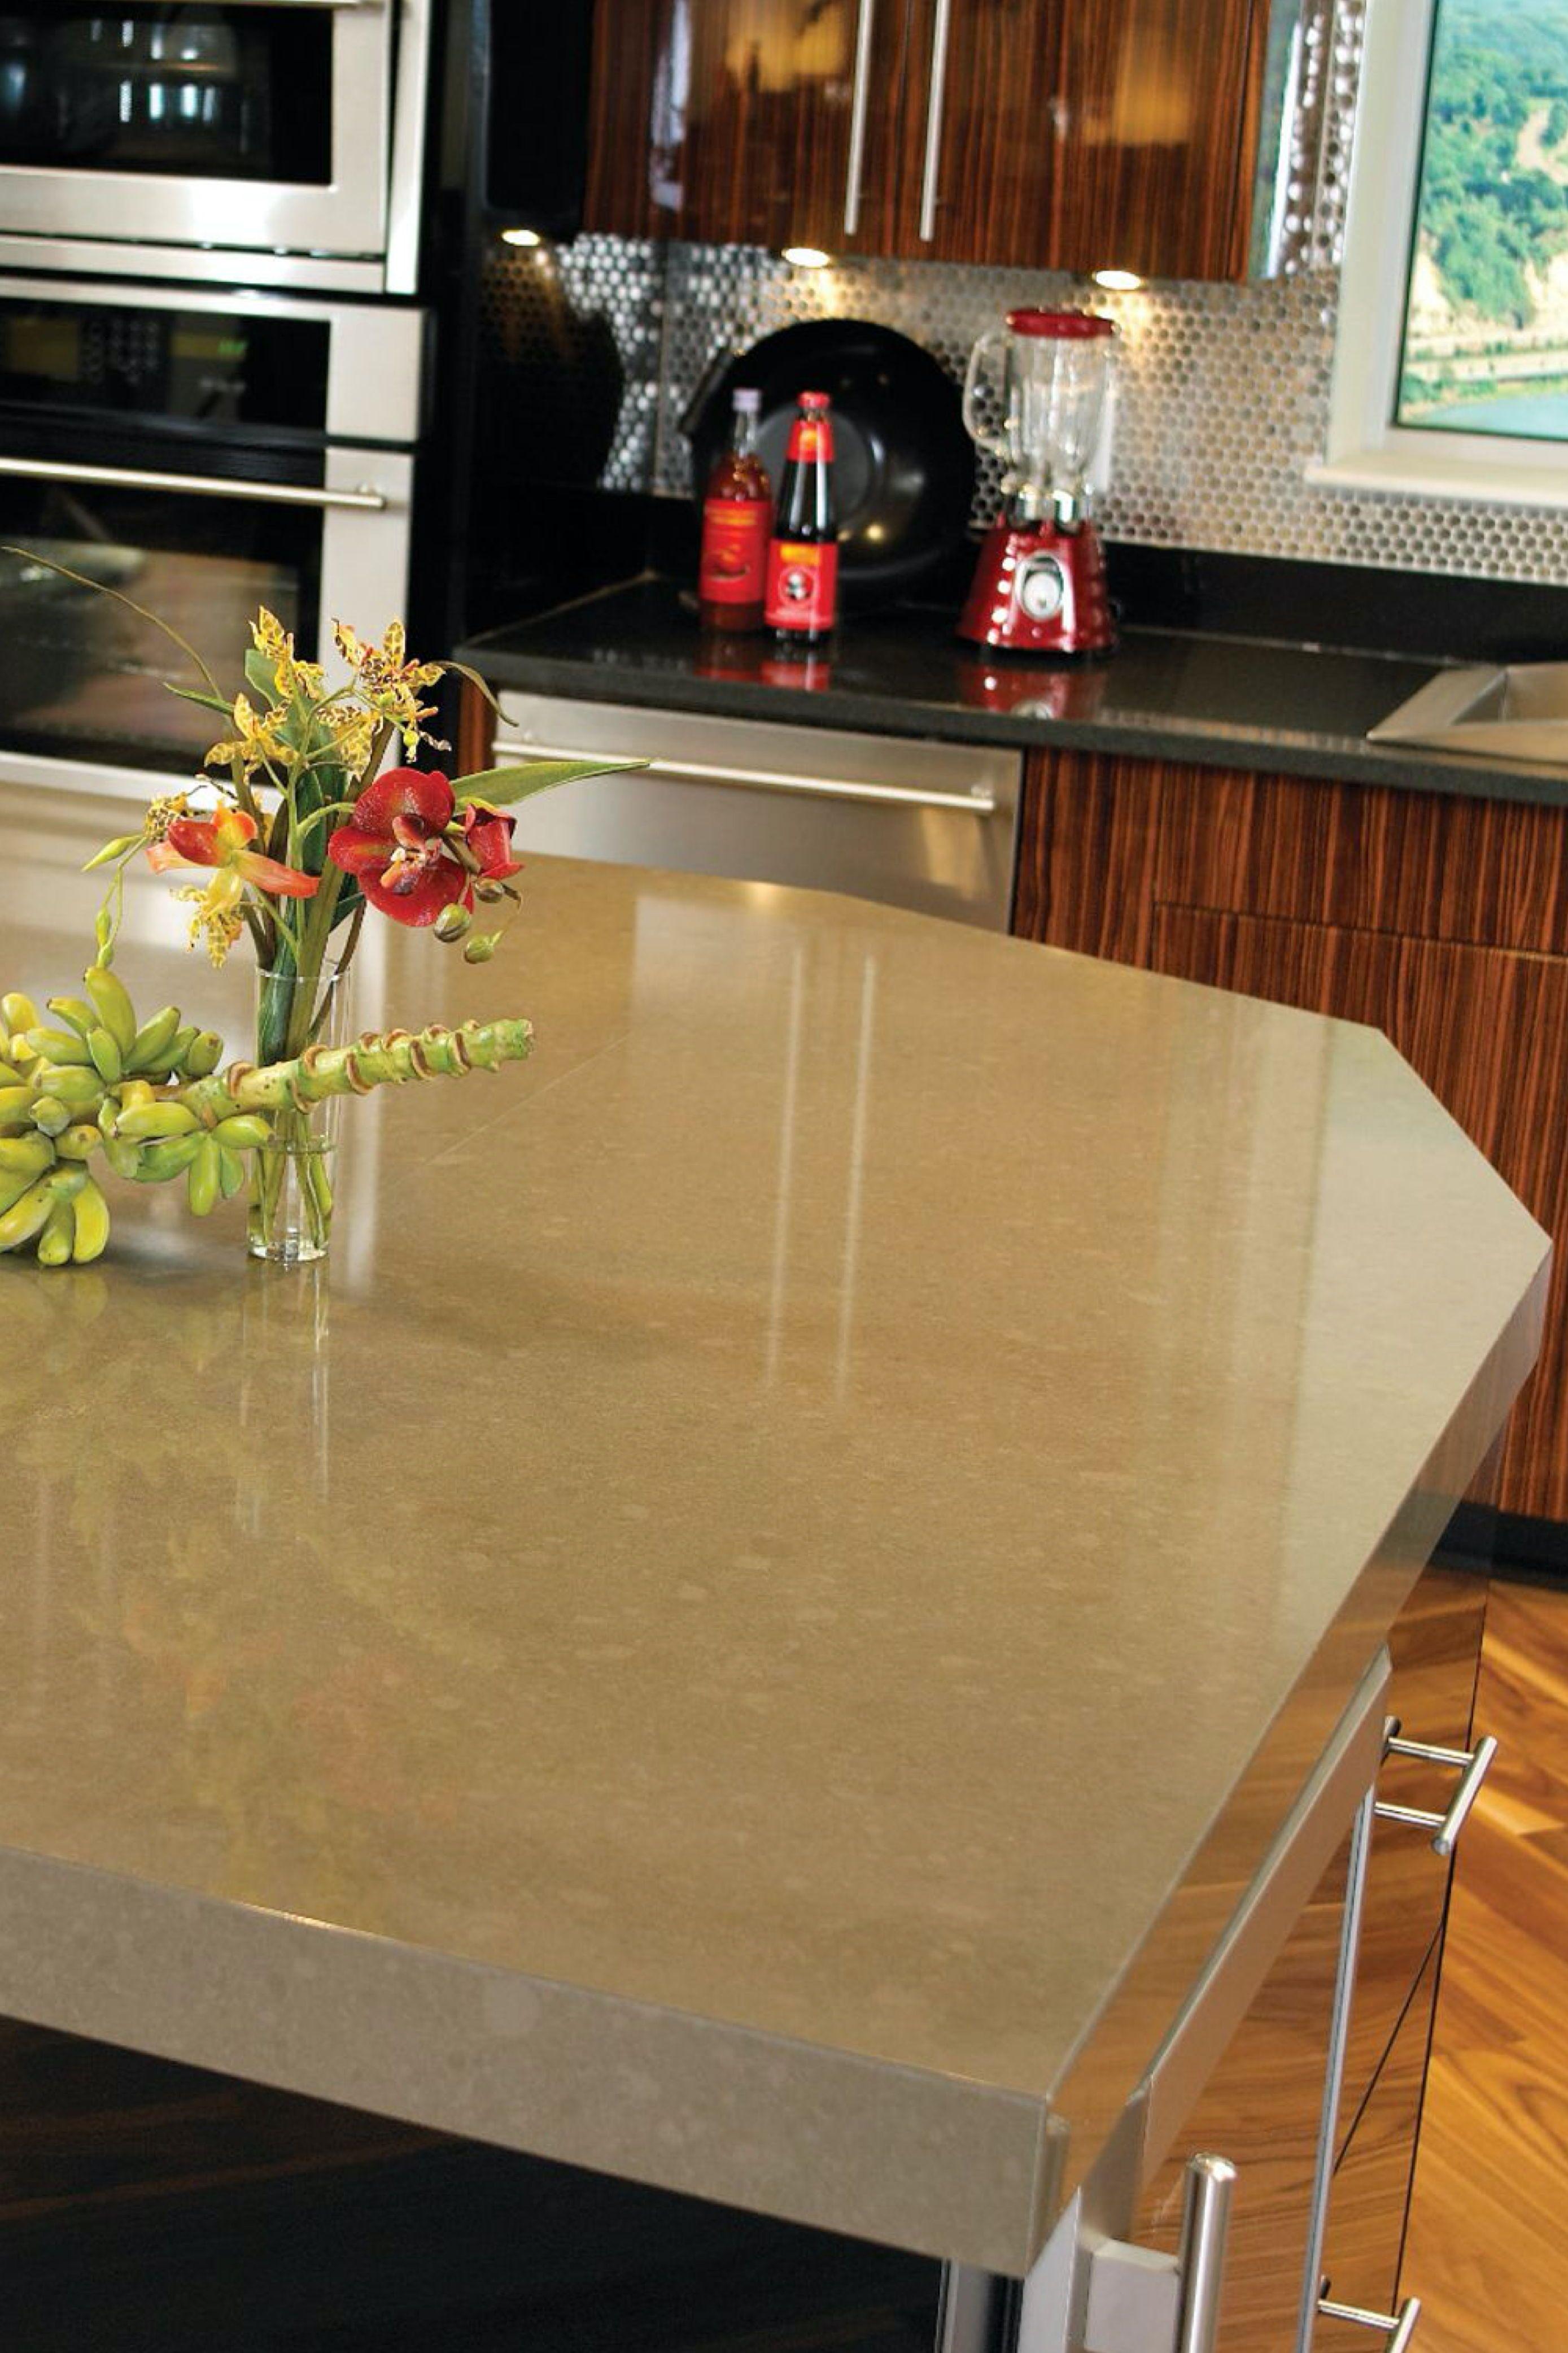 Sussex Cambria Quartz Countertops Cost Reviews Kitchen Island Countertop Quartz Kitchen Countertops Cambria Quartz Countertops